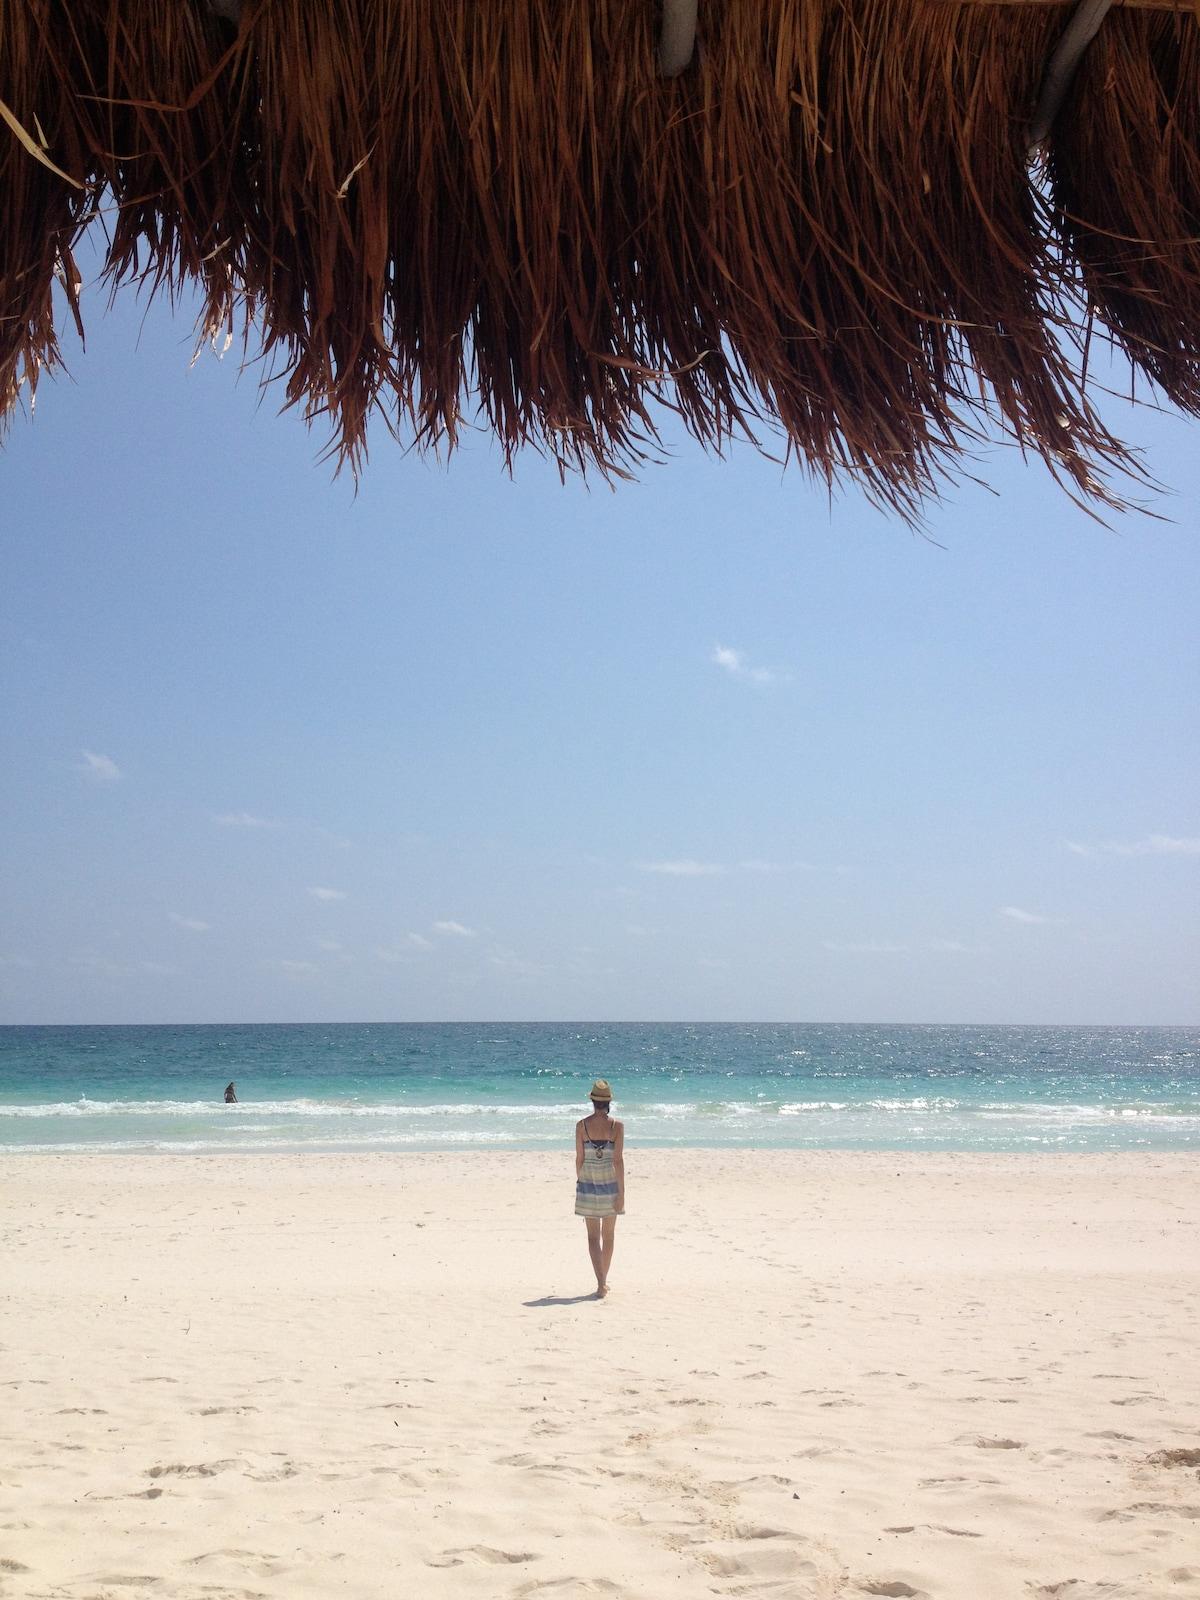 Lara from Playa del Carmen